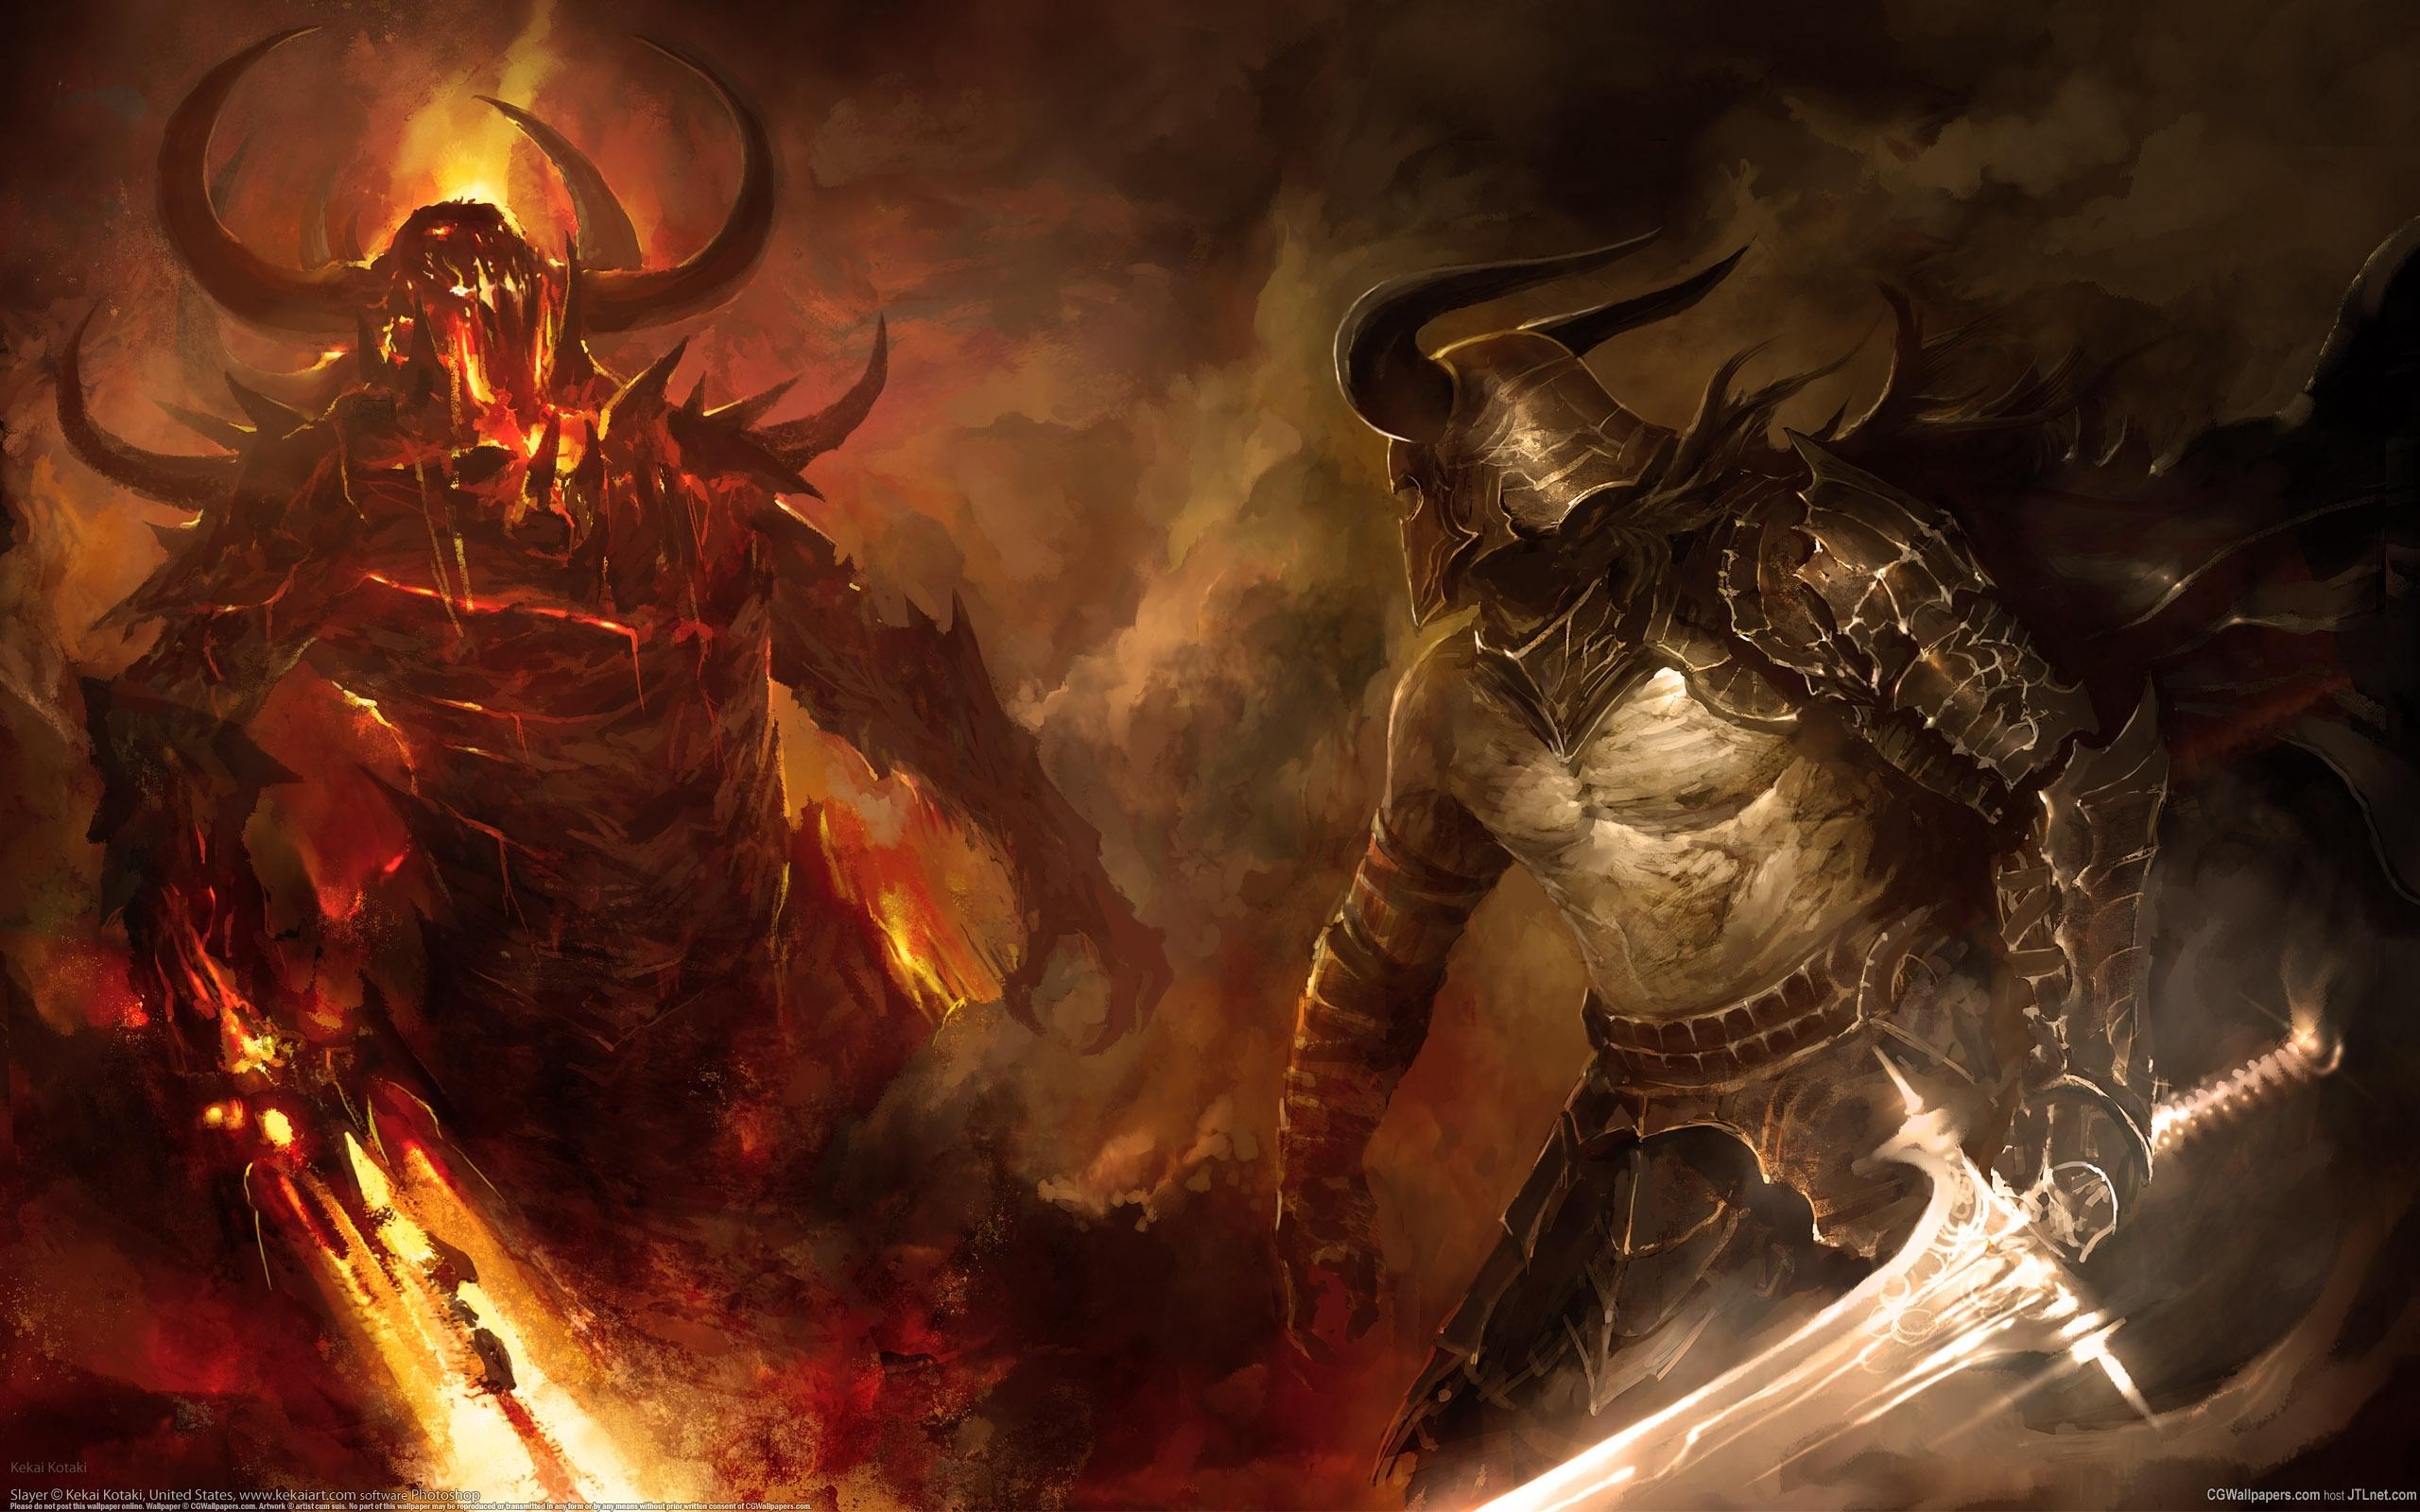 picture of good fighting evil | hd good vs evil warrior version